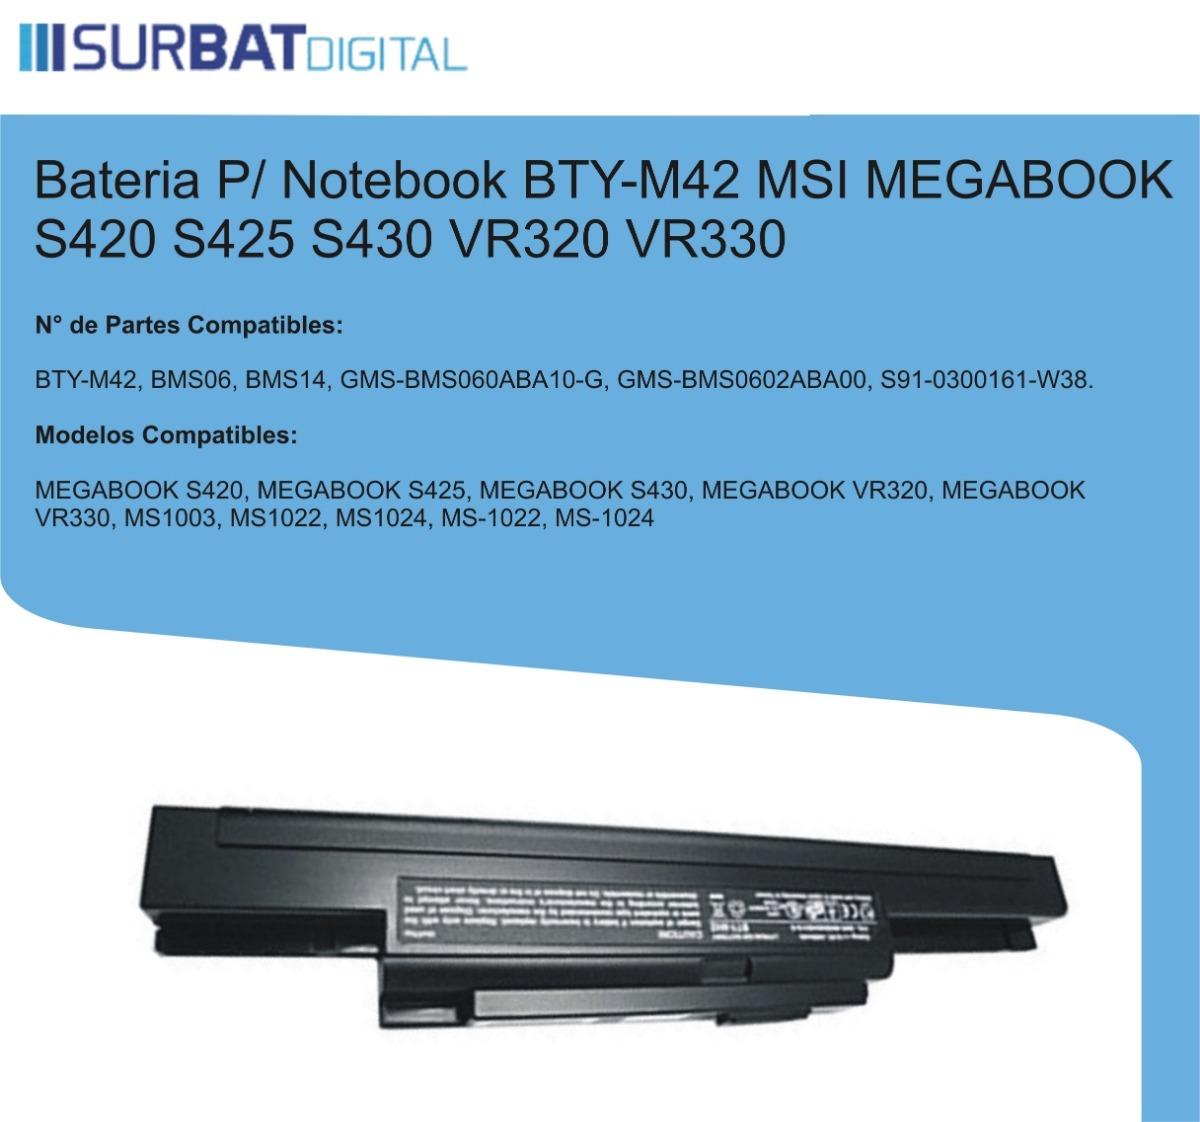 MSI MEGABOOK VR330 WINDOWS 10 DRIVERS DOWNLOAD